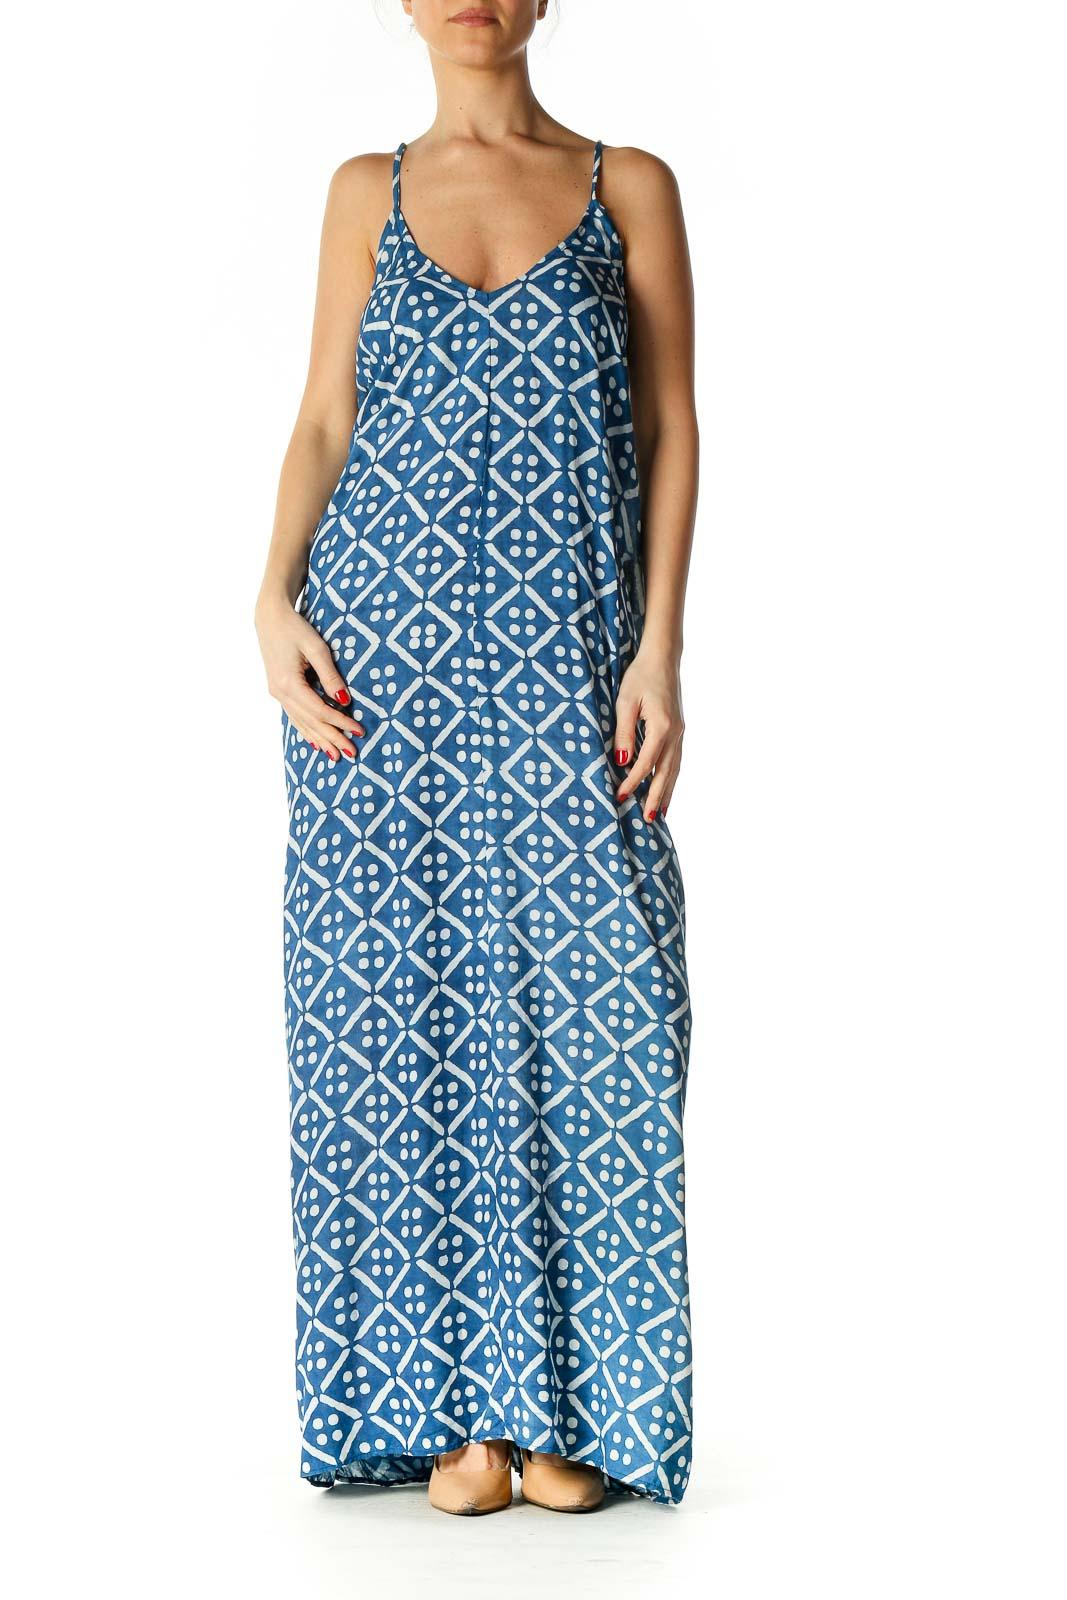 Blue Geometric Print Bohemian Column Dress Front